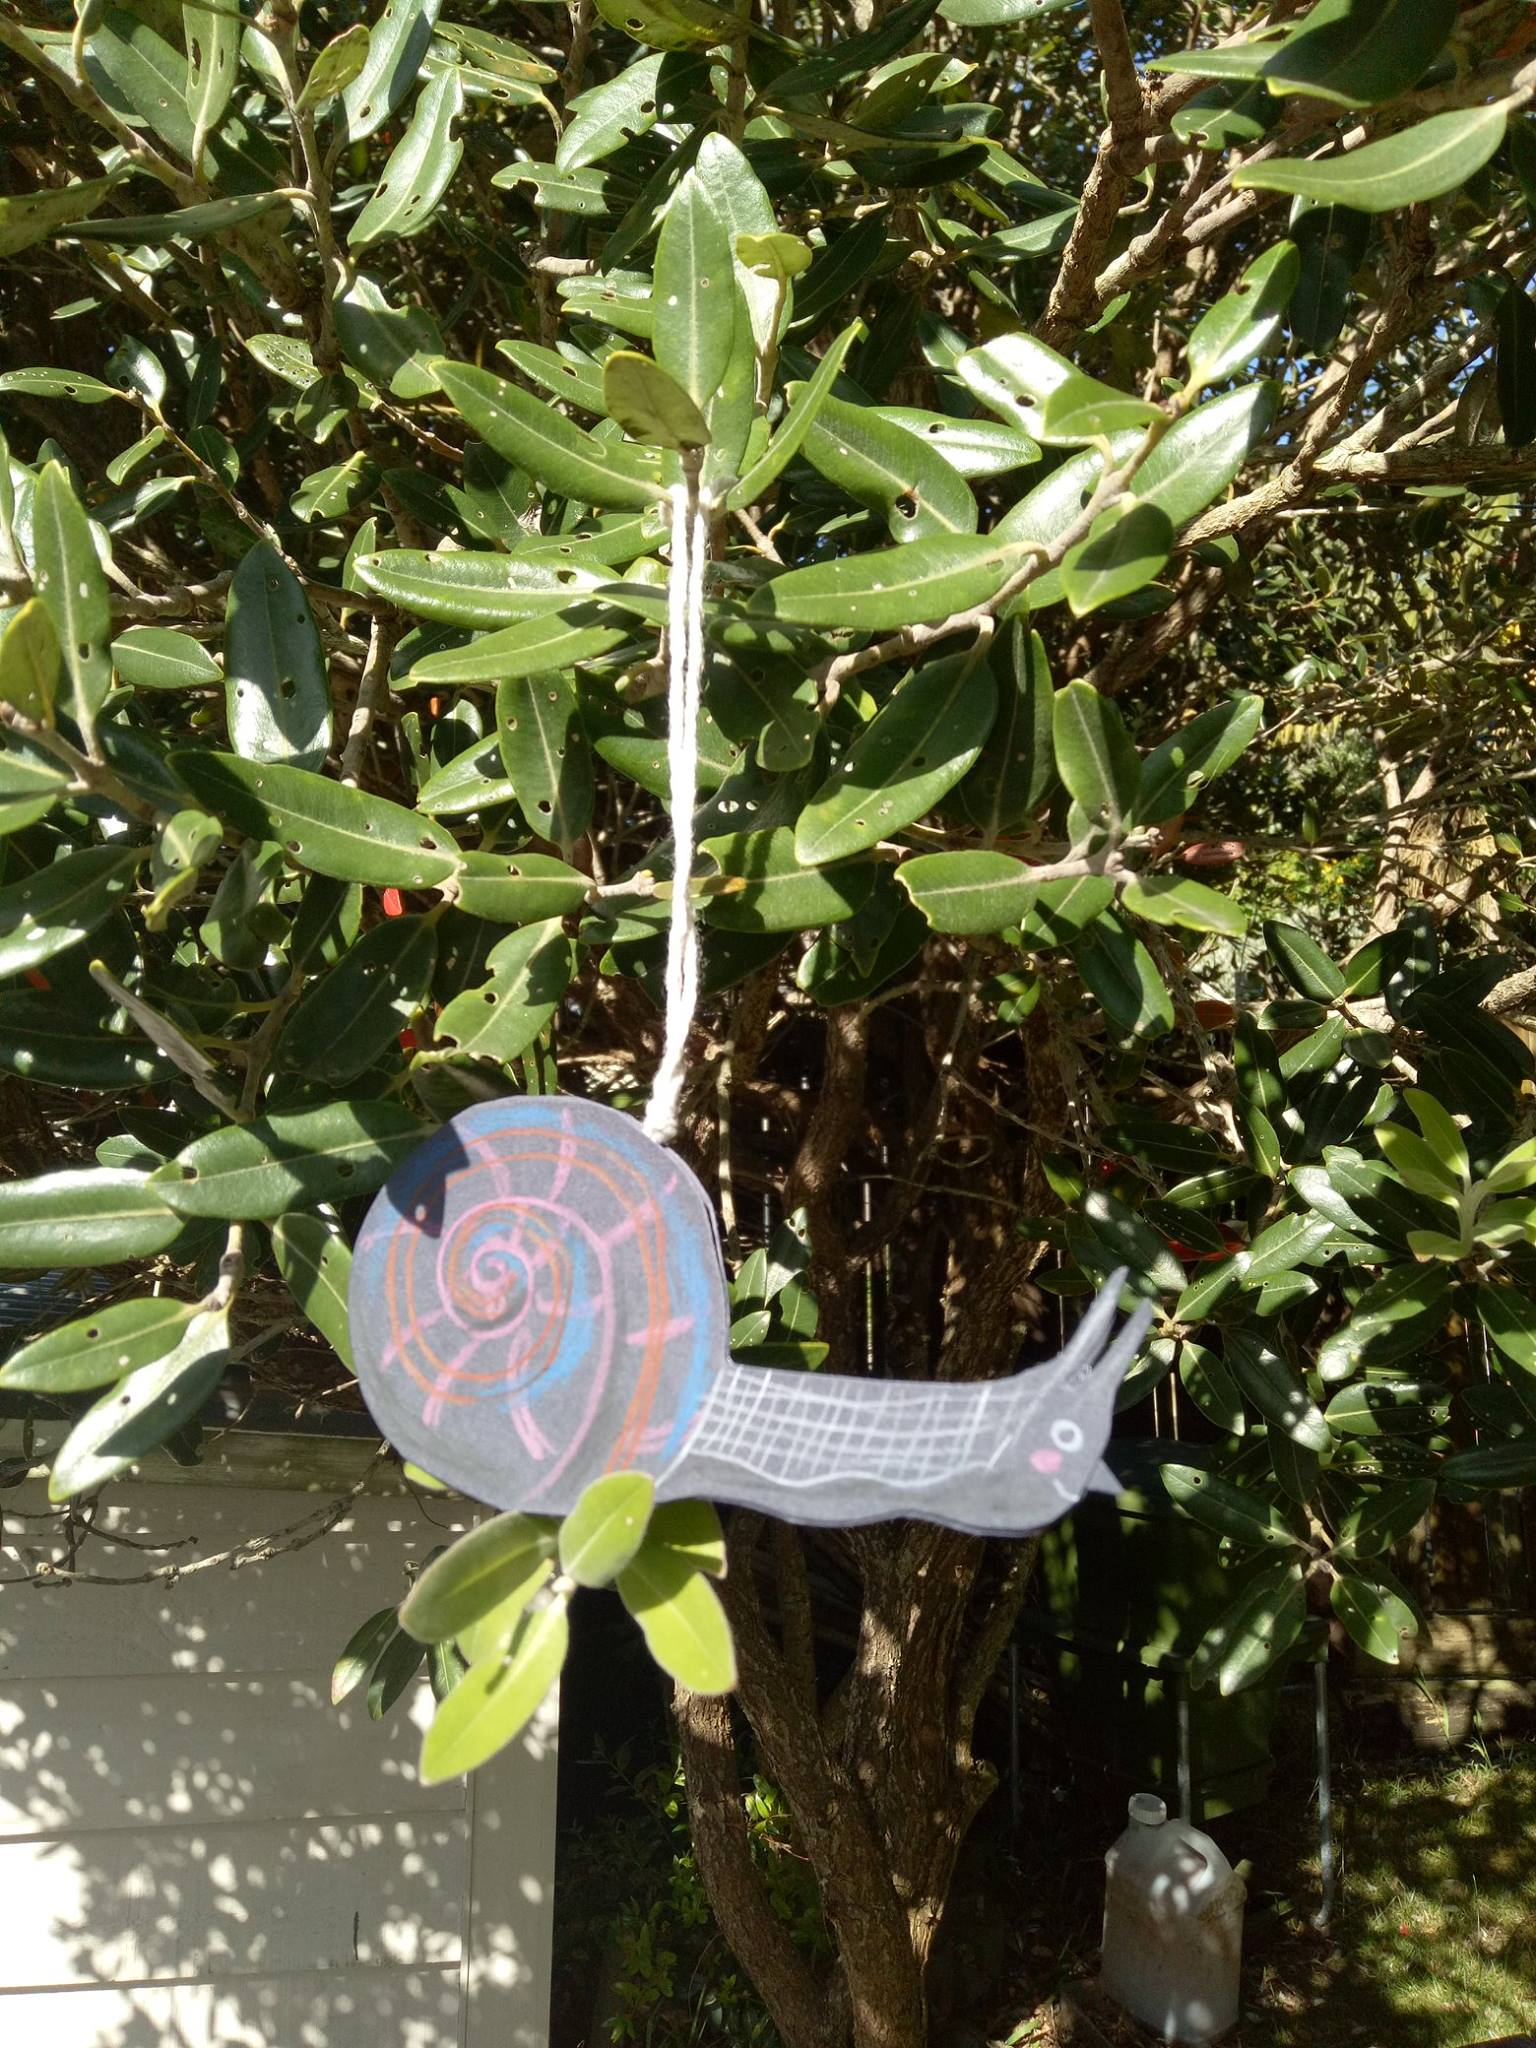 Paper cut snail - coloured pencil on paper. Paper ornament workshop example .